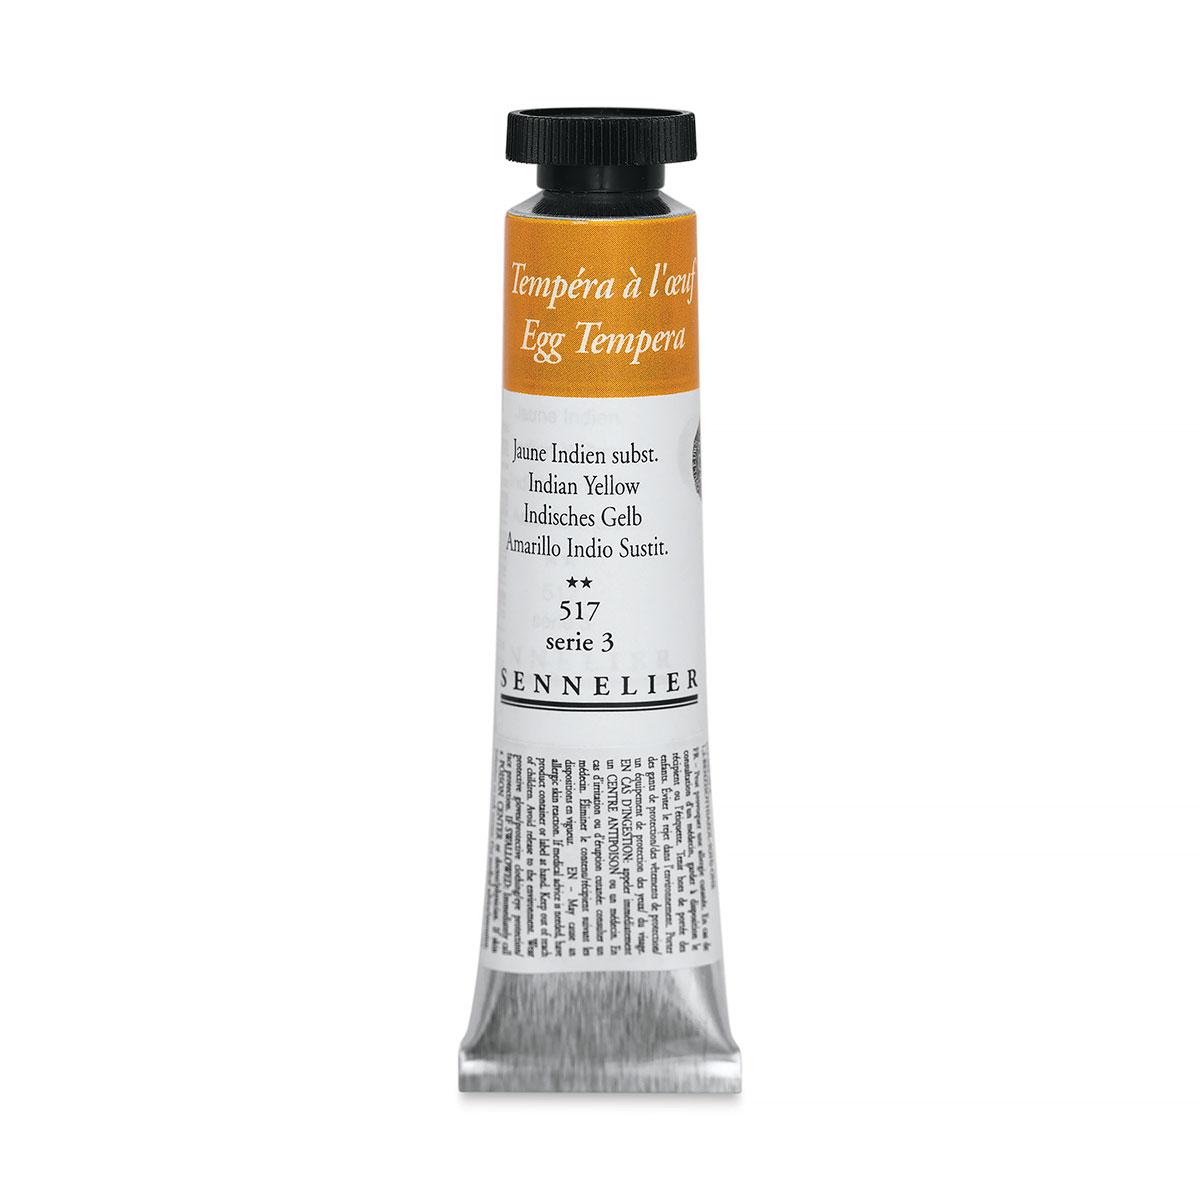 Sennelier Artists Egg Tempera - Indian Yellow, 21 ml tube